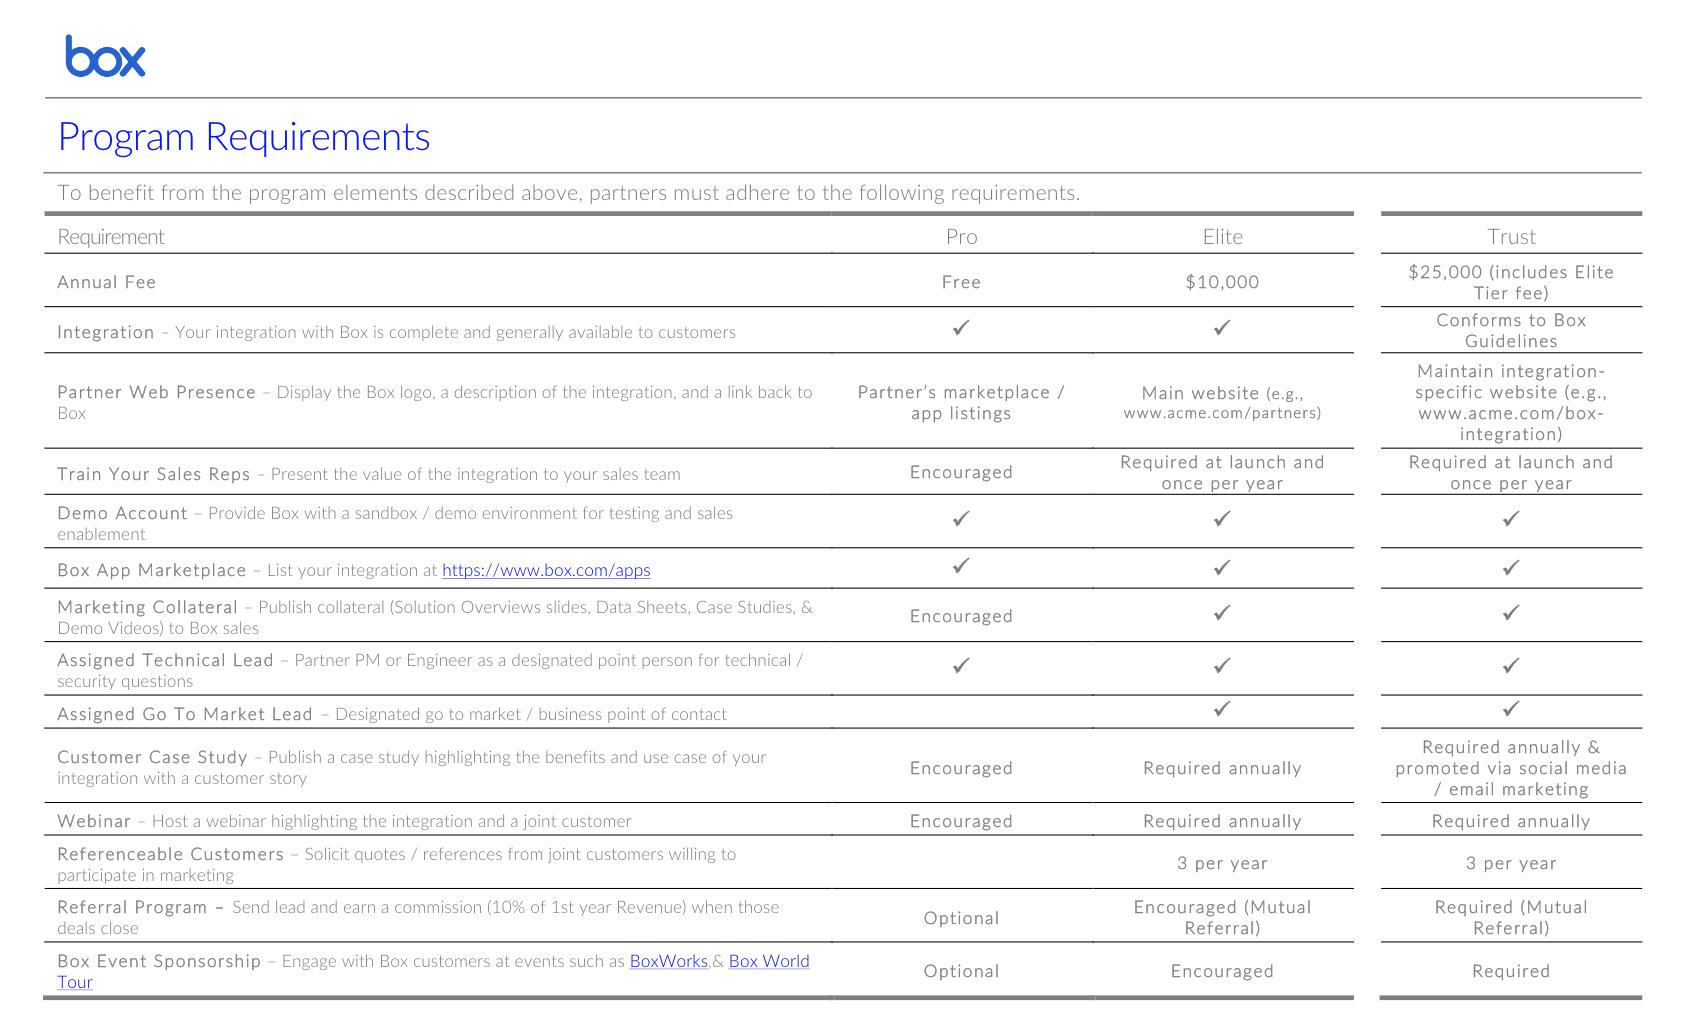 Box program requirements